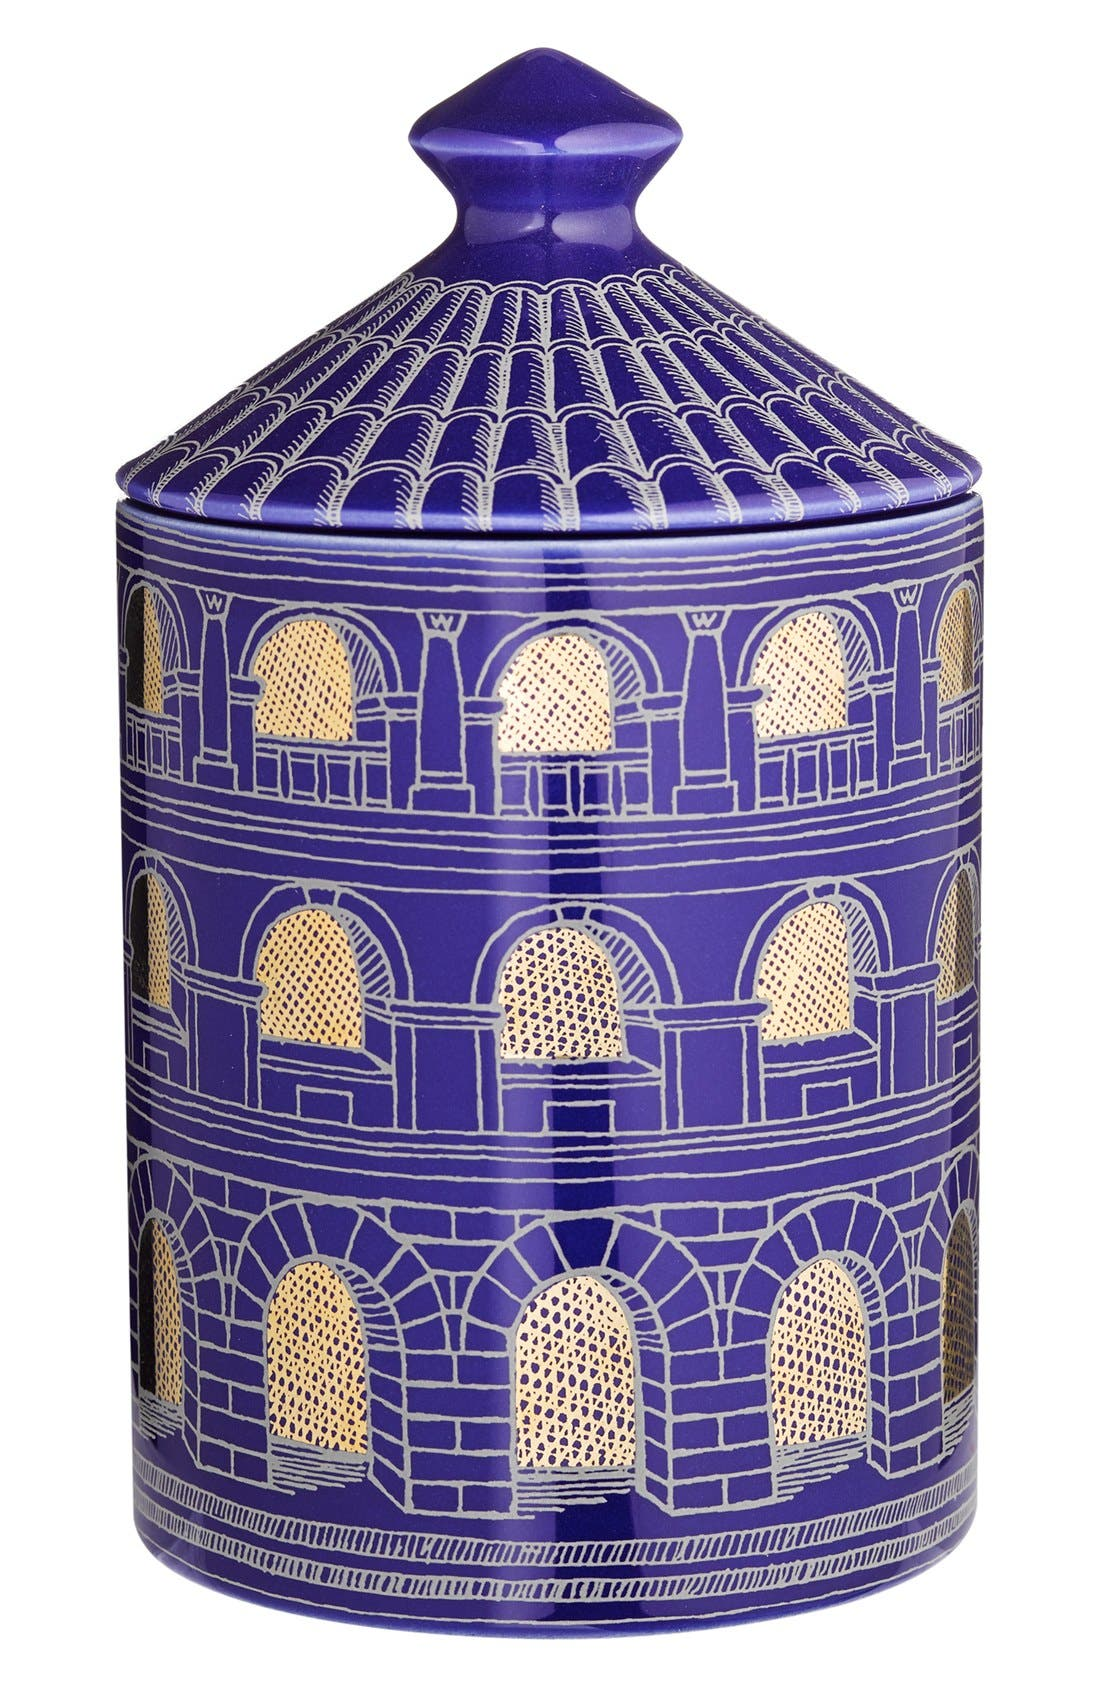 Fornasetti 'Architettura Negativo - Otto' Lidded Candle